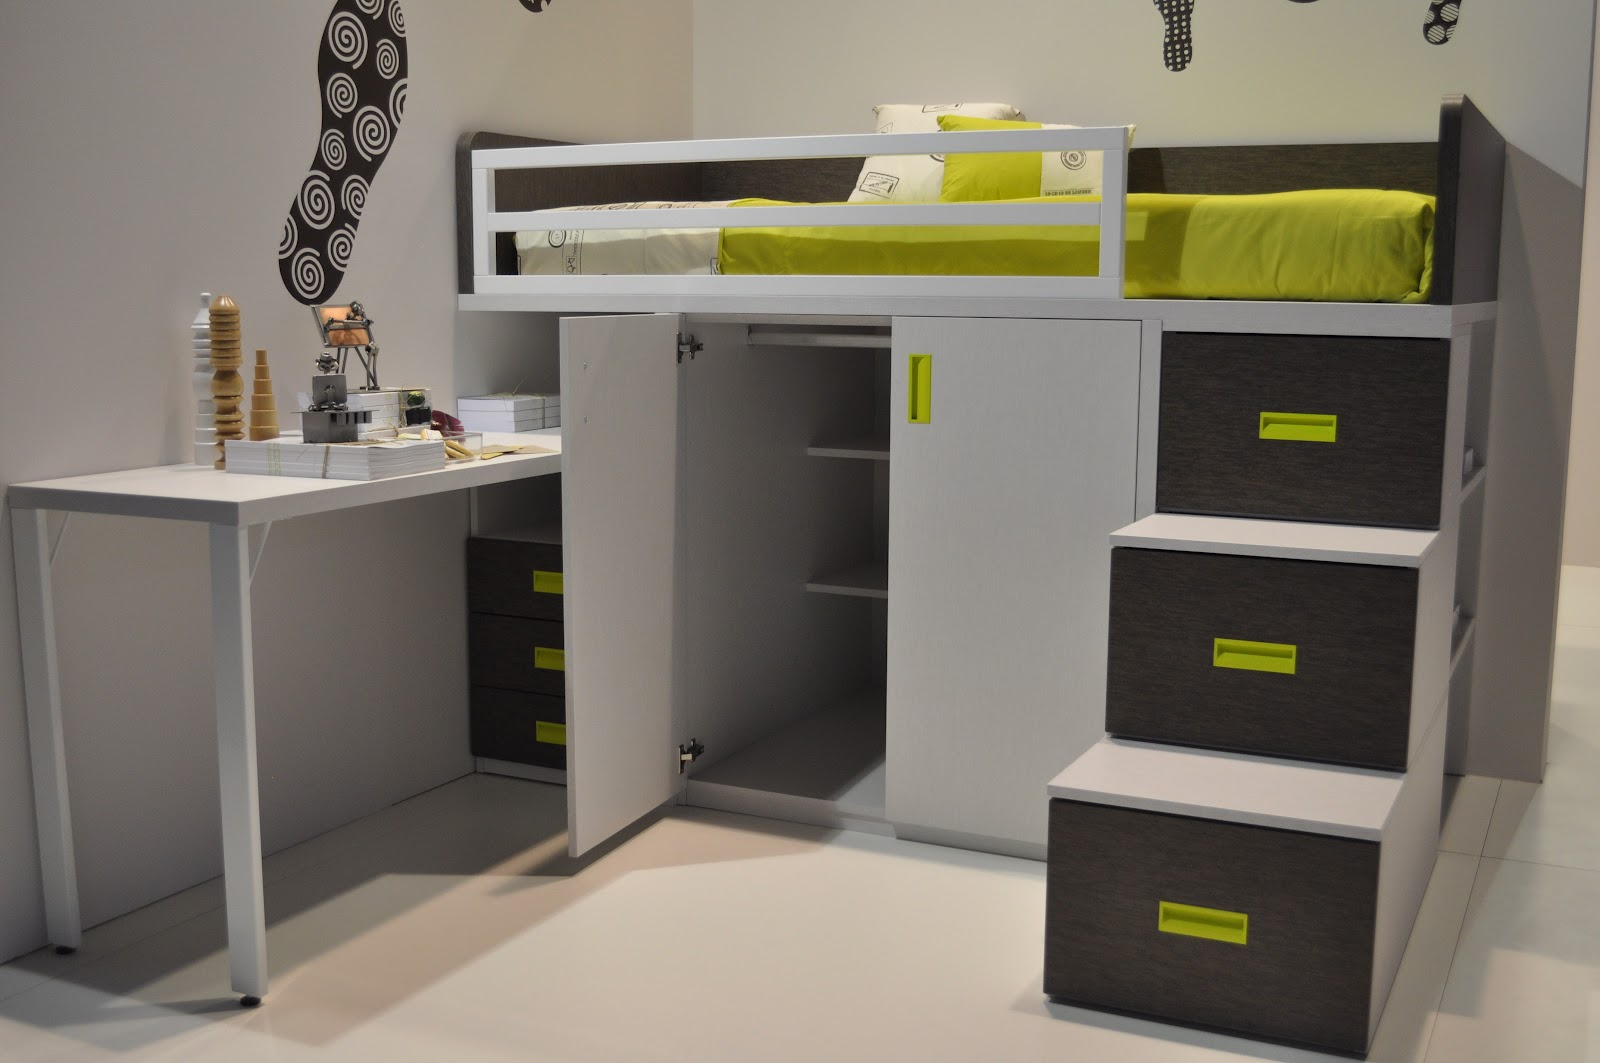 Muebles ros feria habitat programa de camas tren de for Camas juveniles modernas